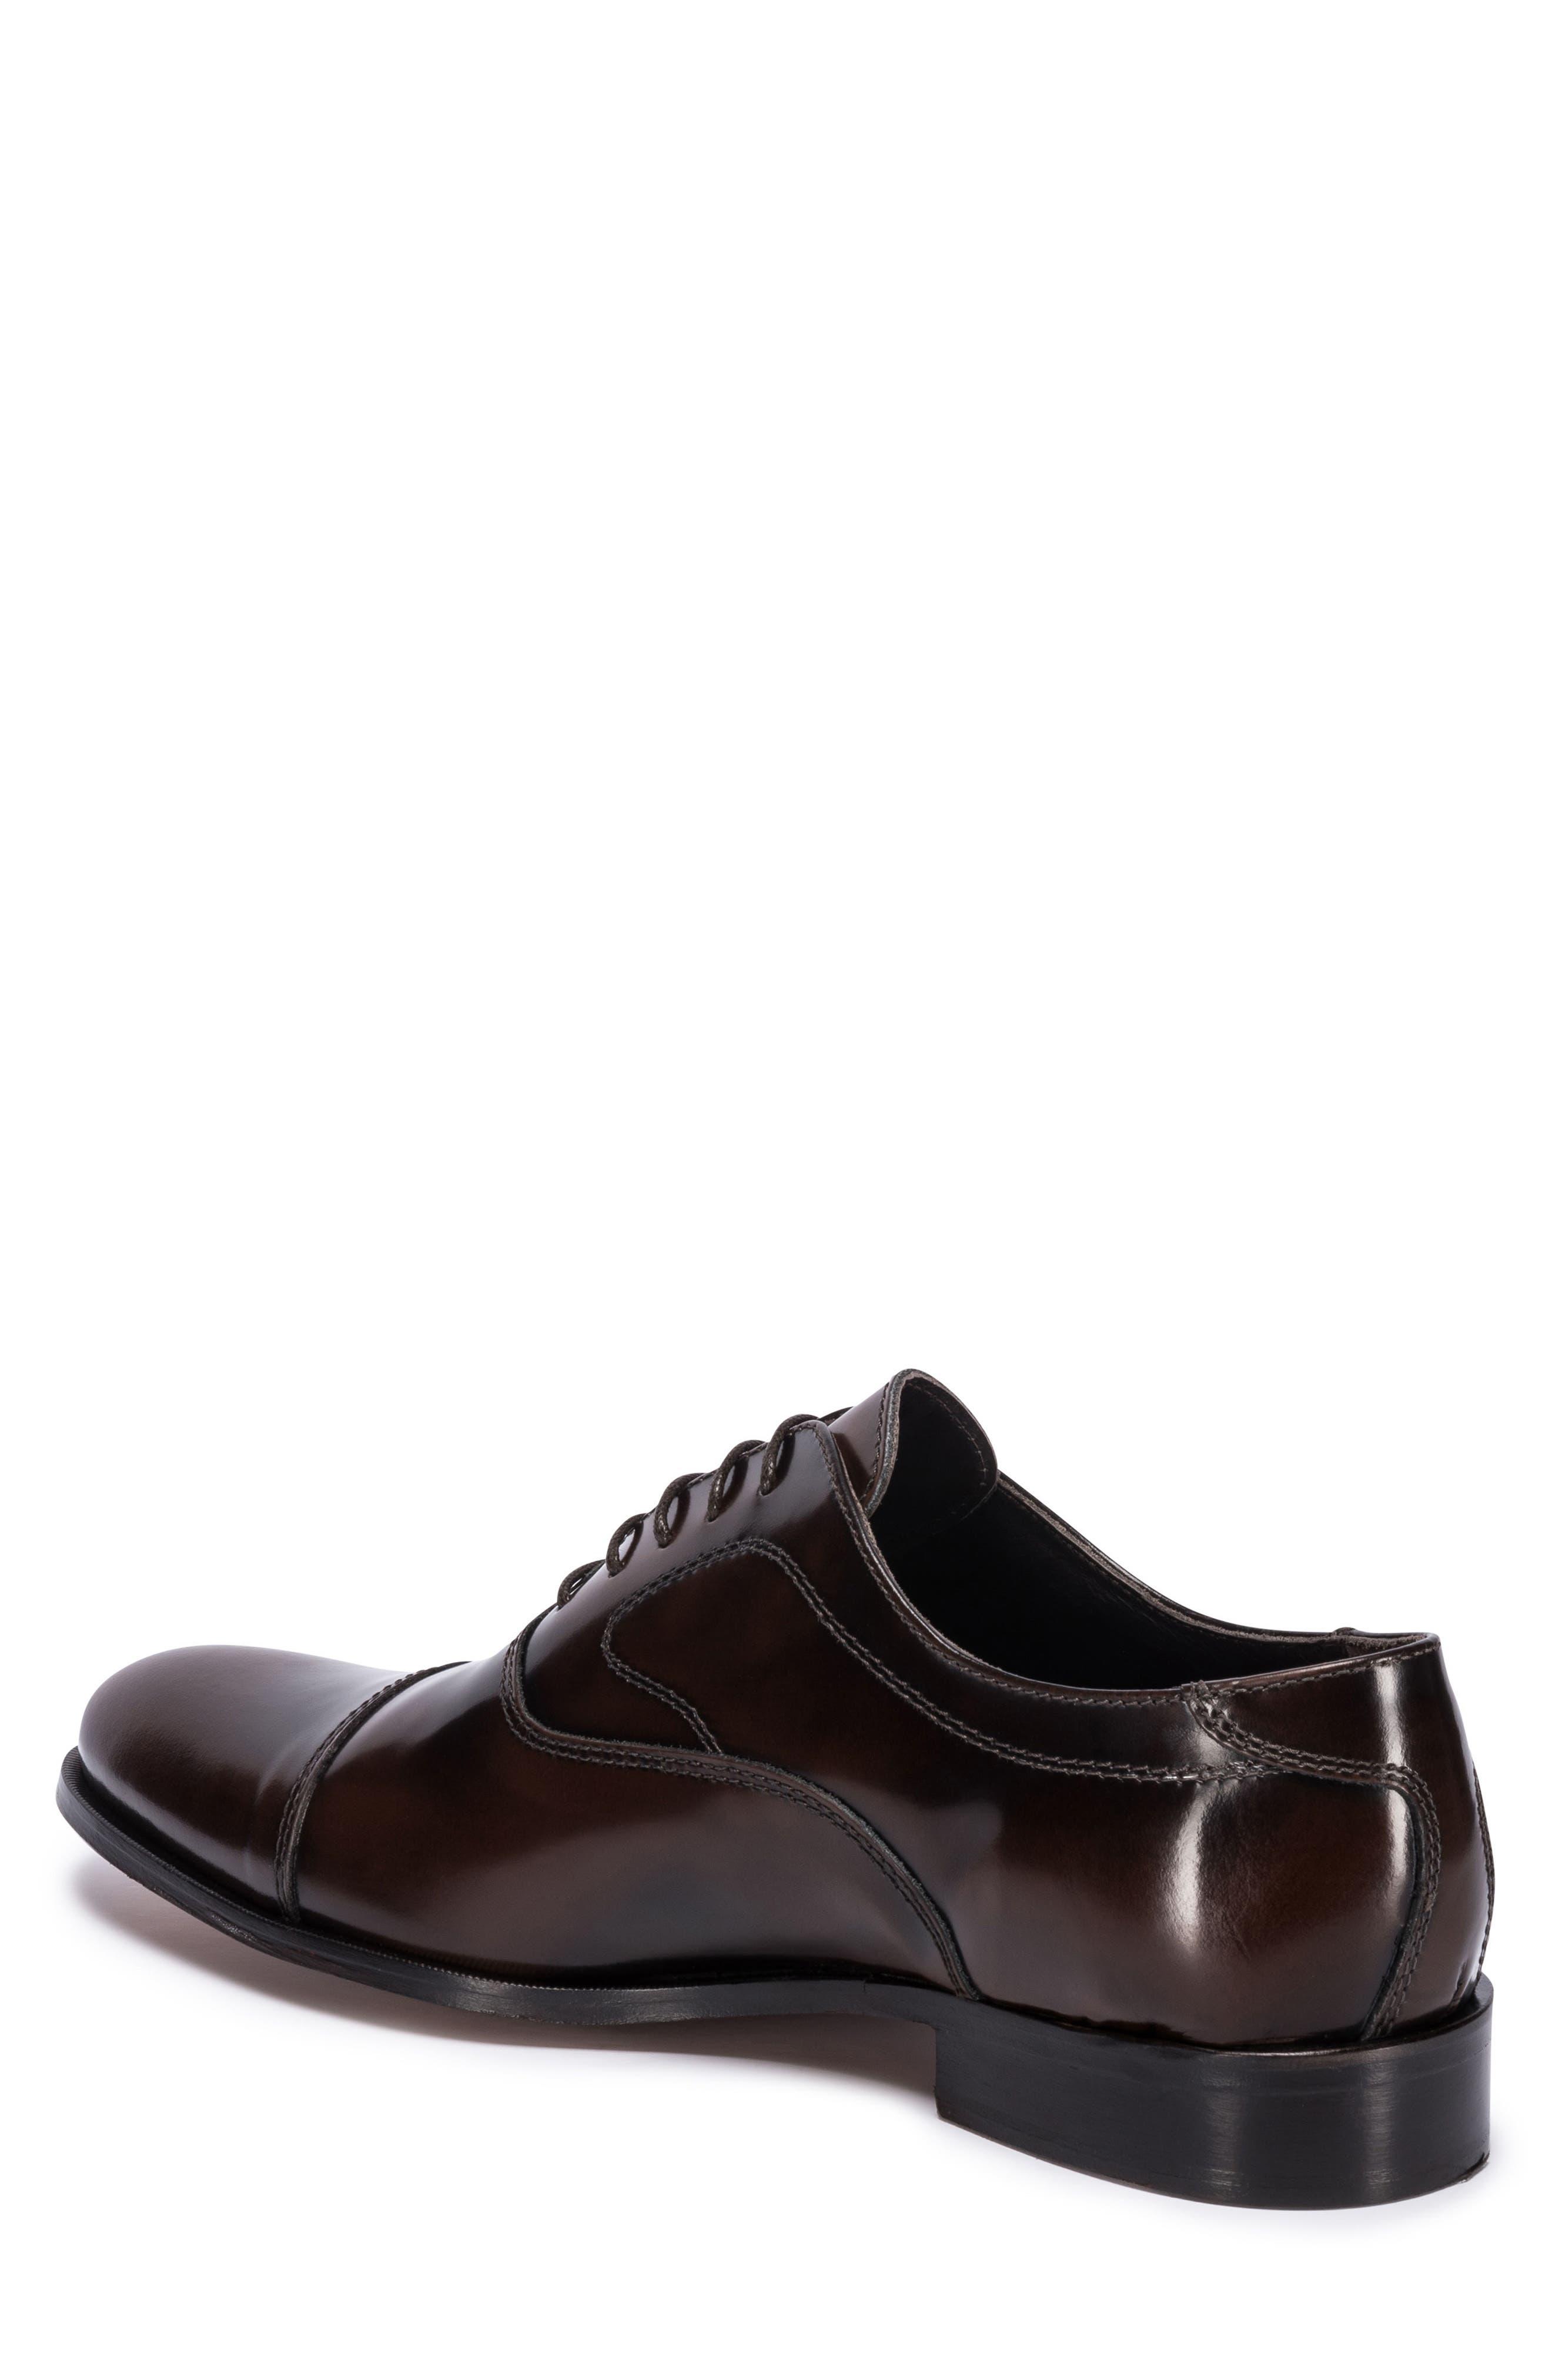 Garda Cap Toe Oxford,                             Alternate thumbnail 2, color,                             Brown Leather